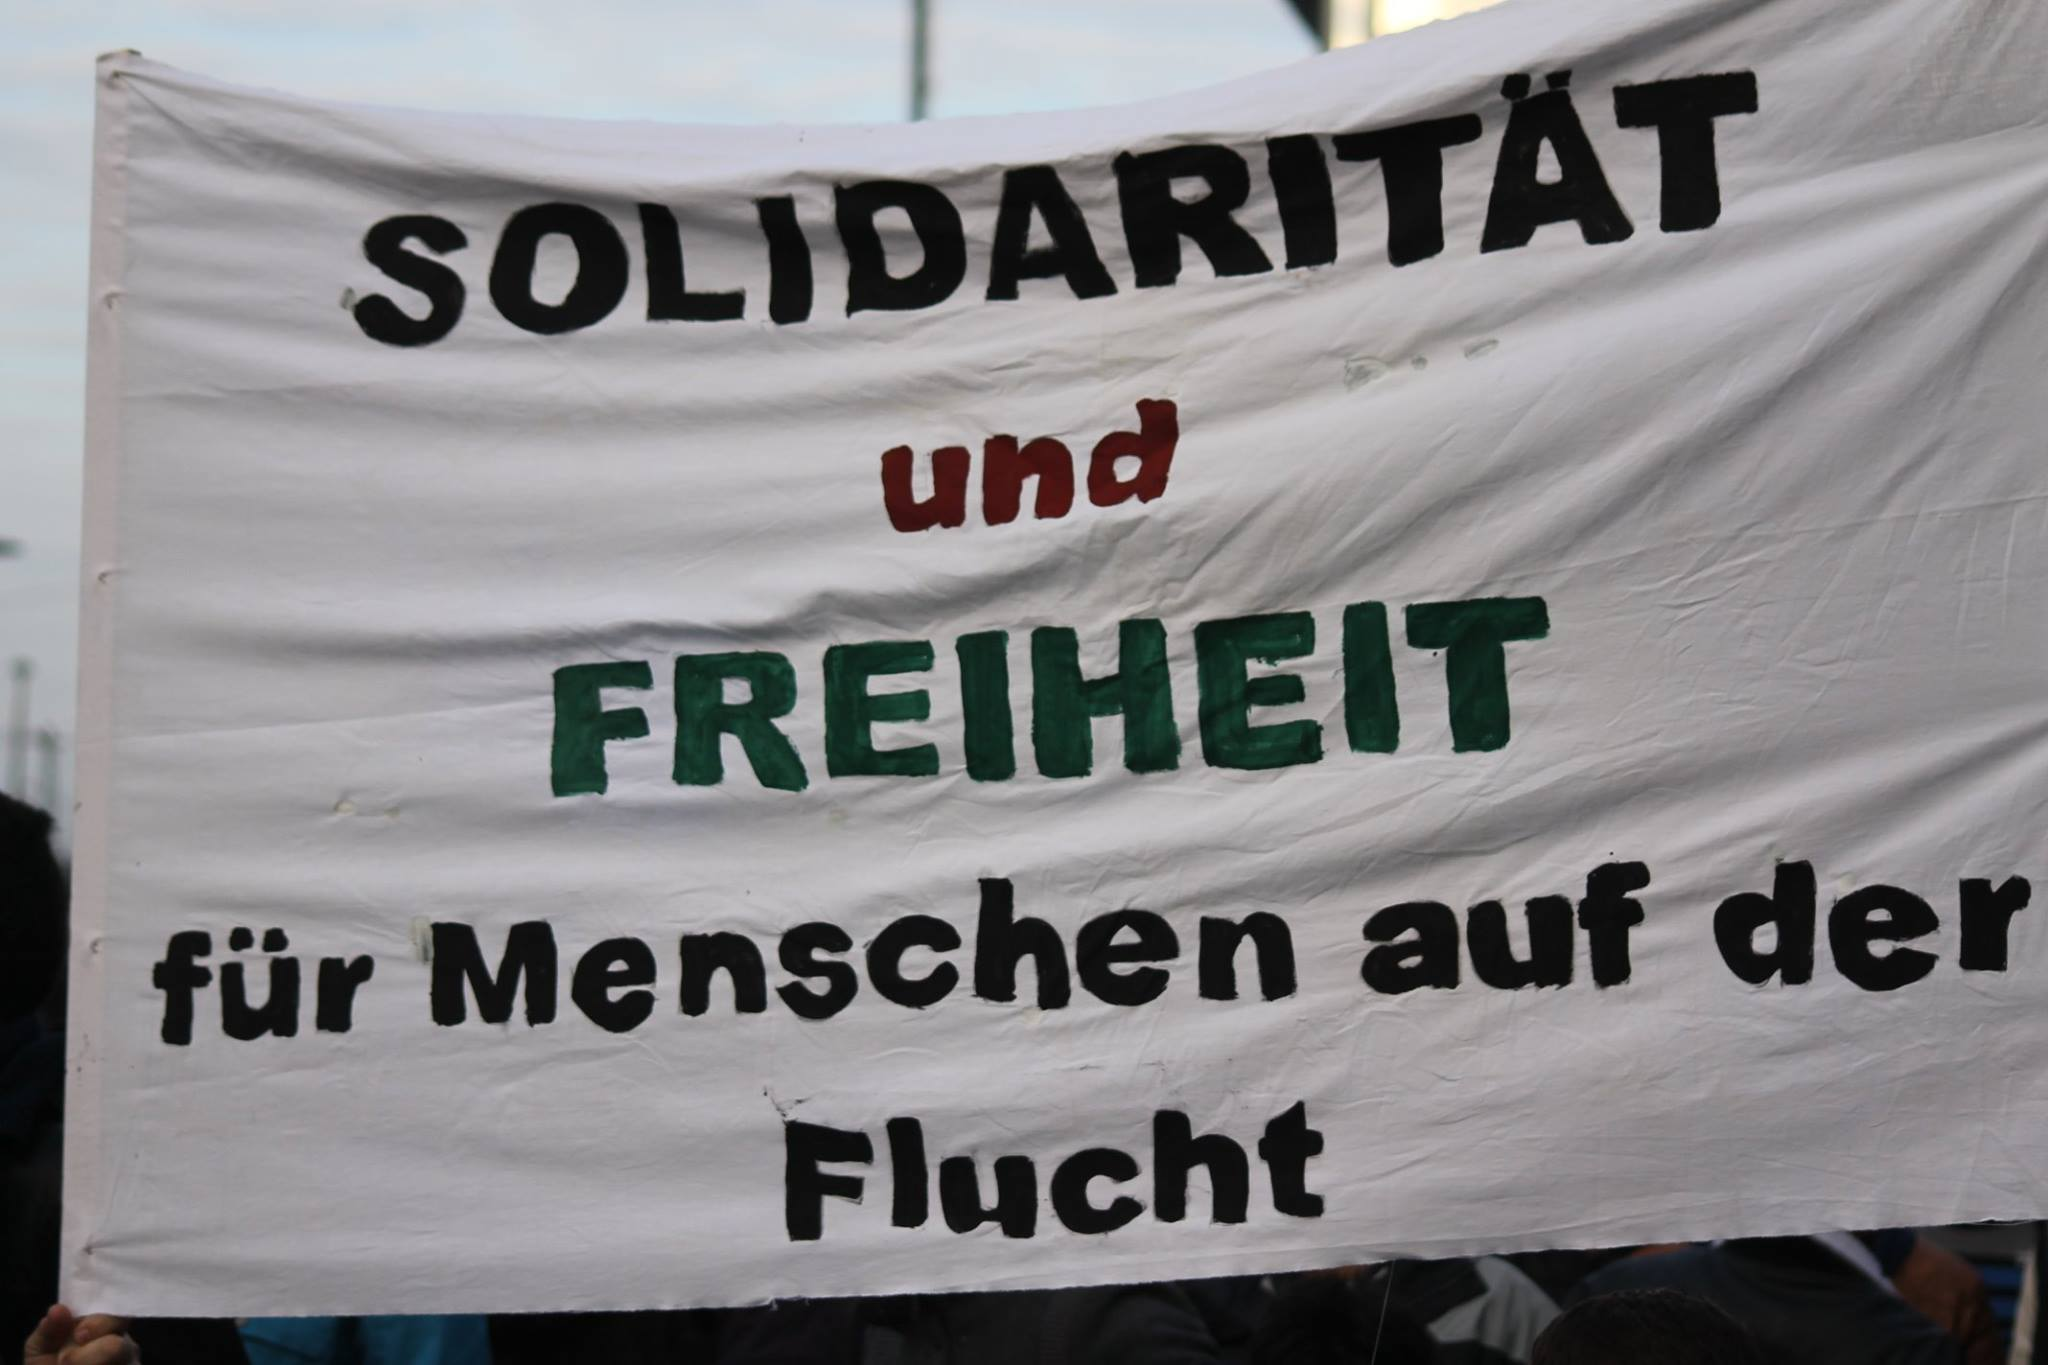 Foto: Siegfried Bernd